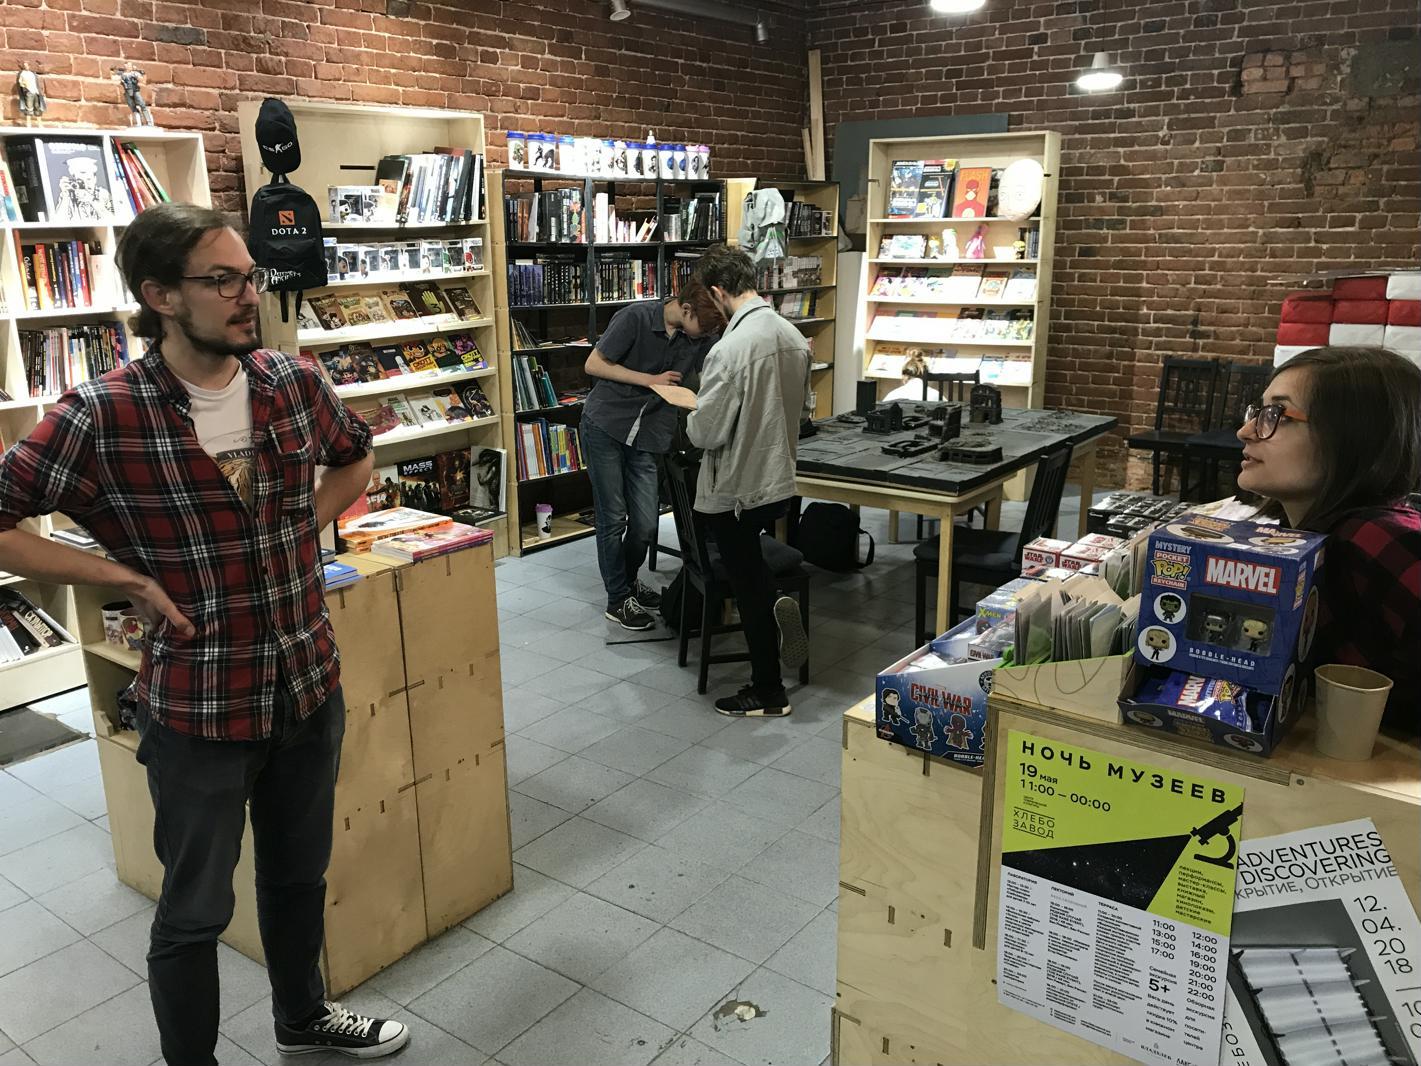 Истории малого бизнеса: Владивосток - 20